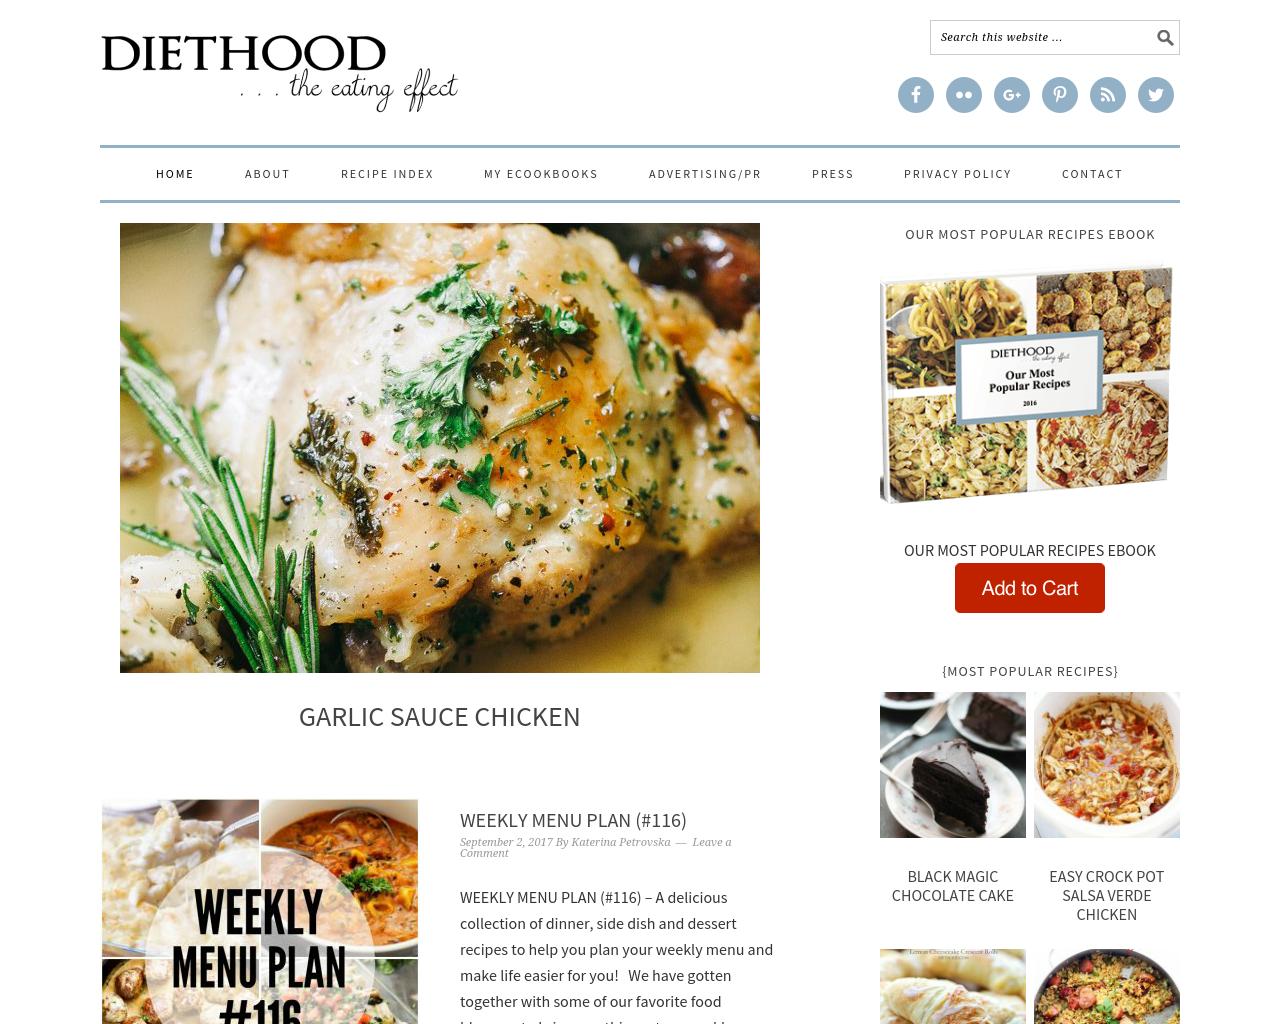 Diethood-Advertising-Reviews-Pricing